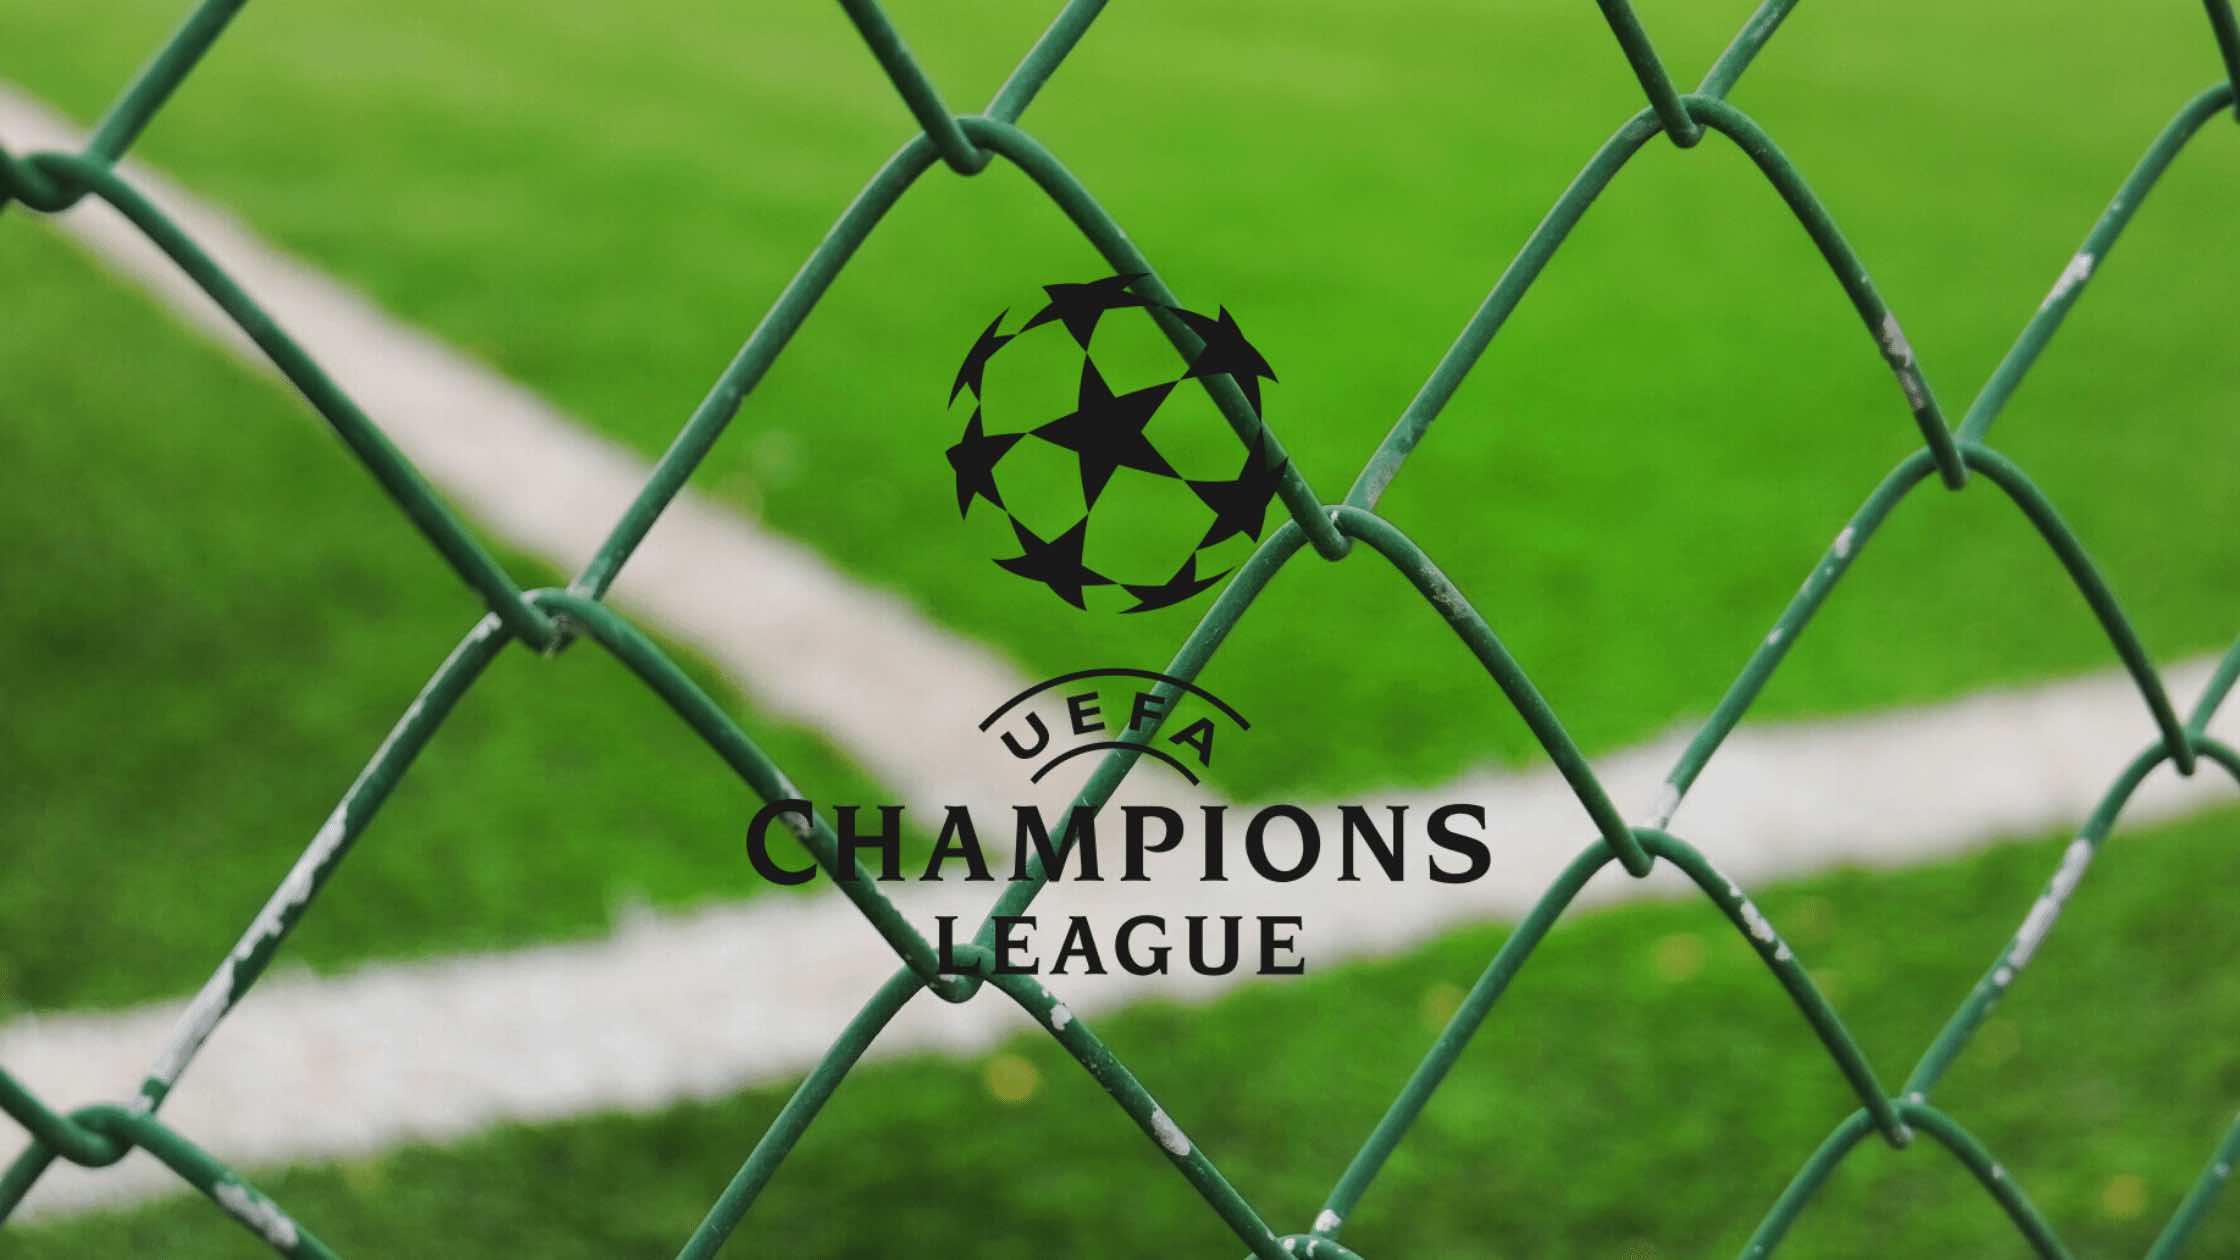 Champions League Gelbe Karten Regel